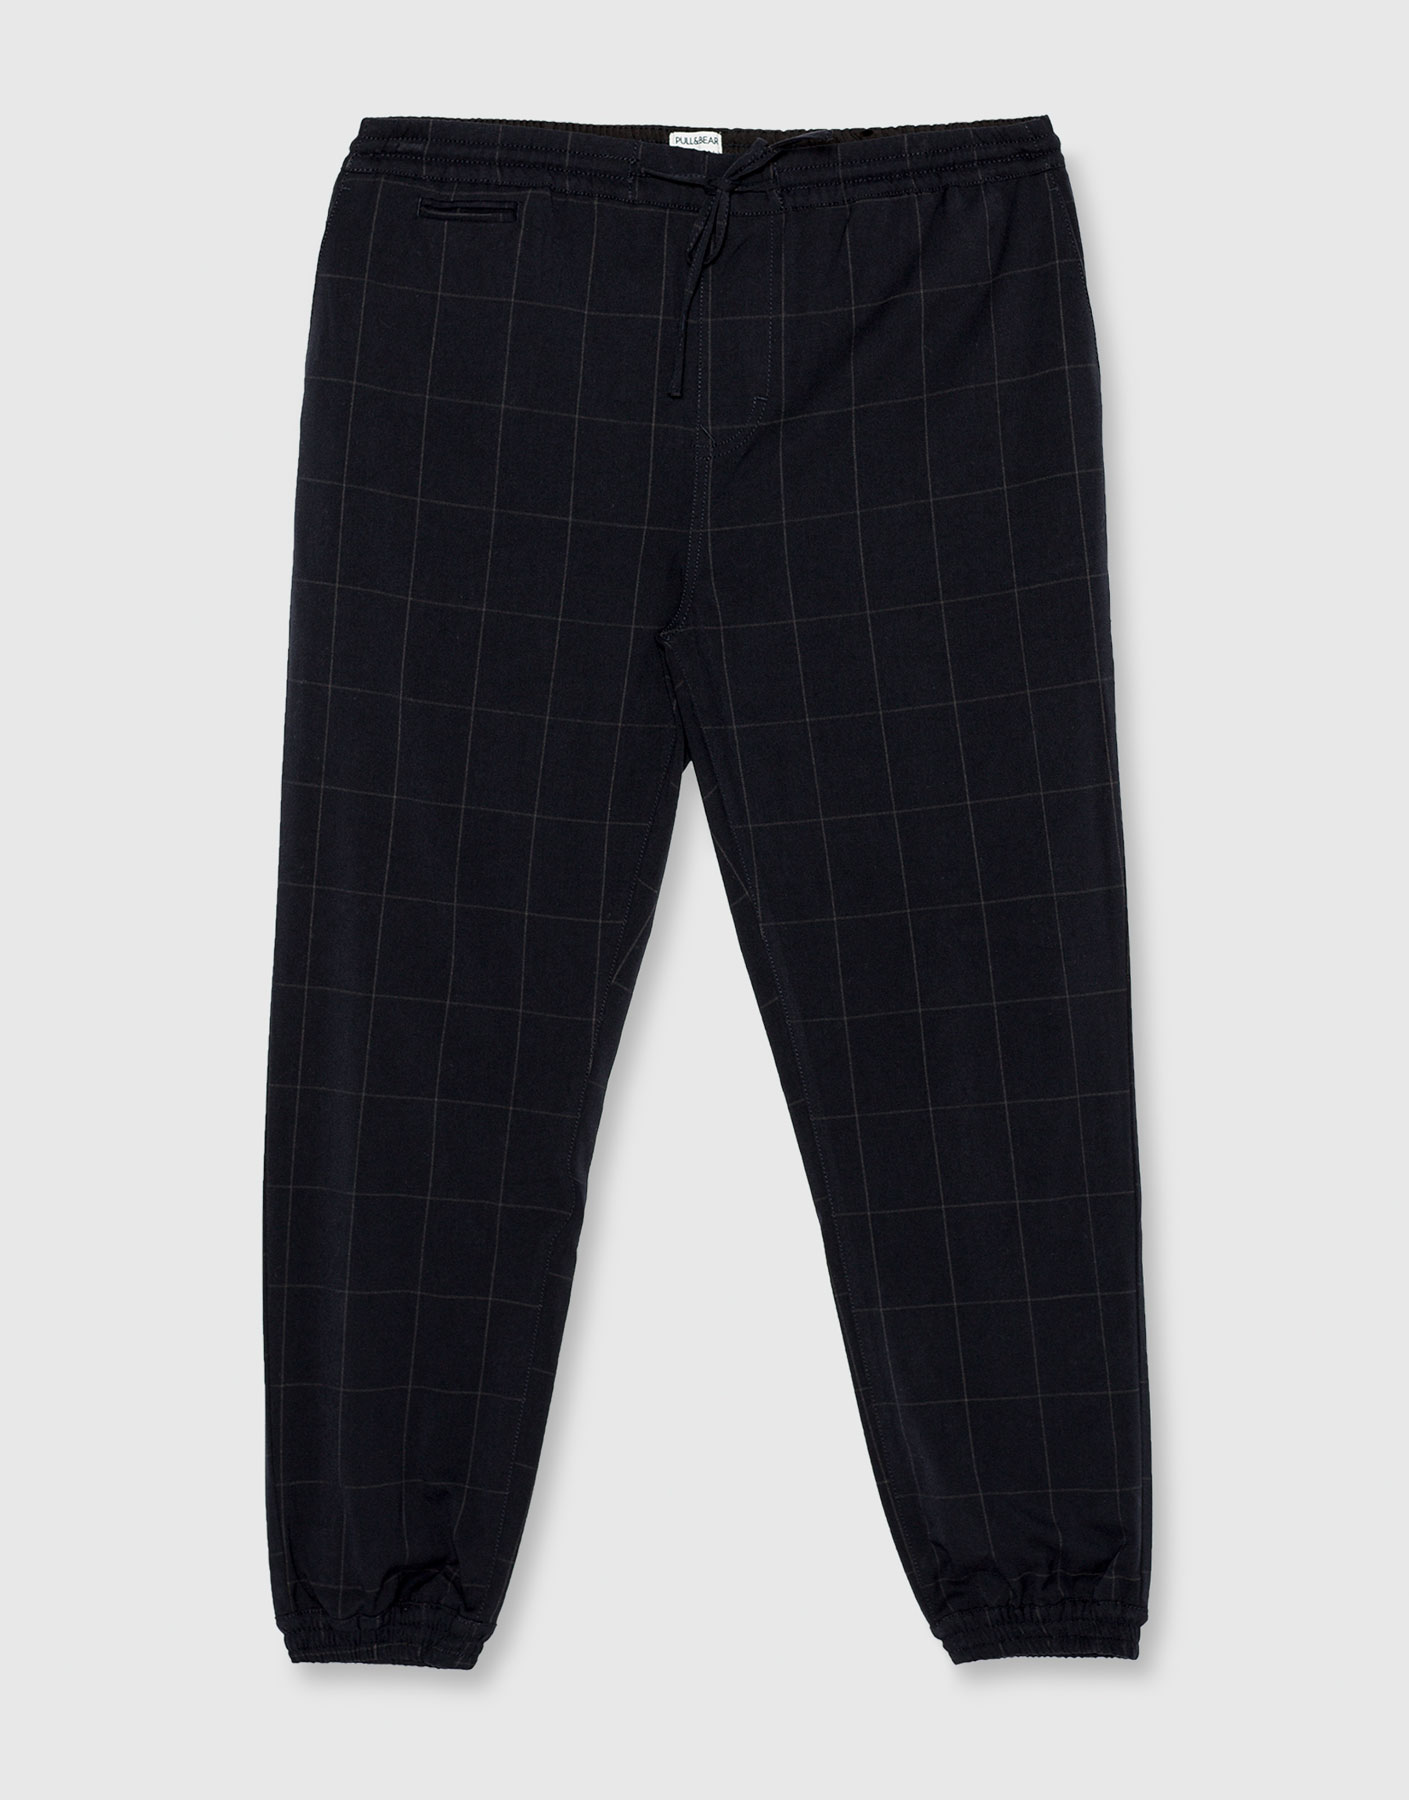 Check beach trousers, £25.99 ( pullandbear.com )